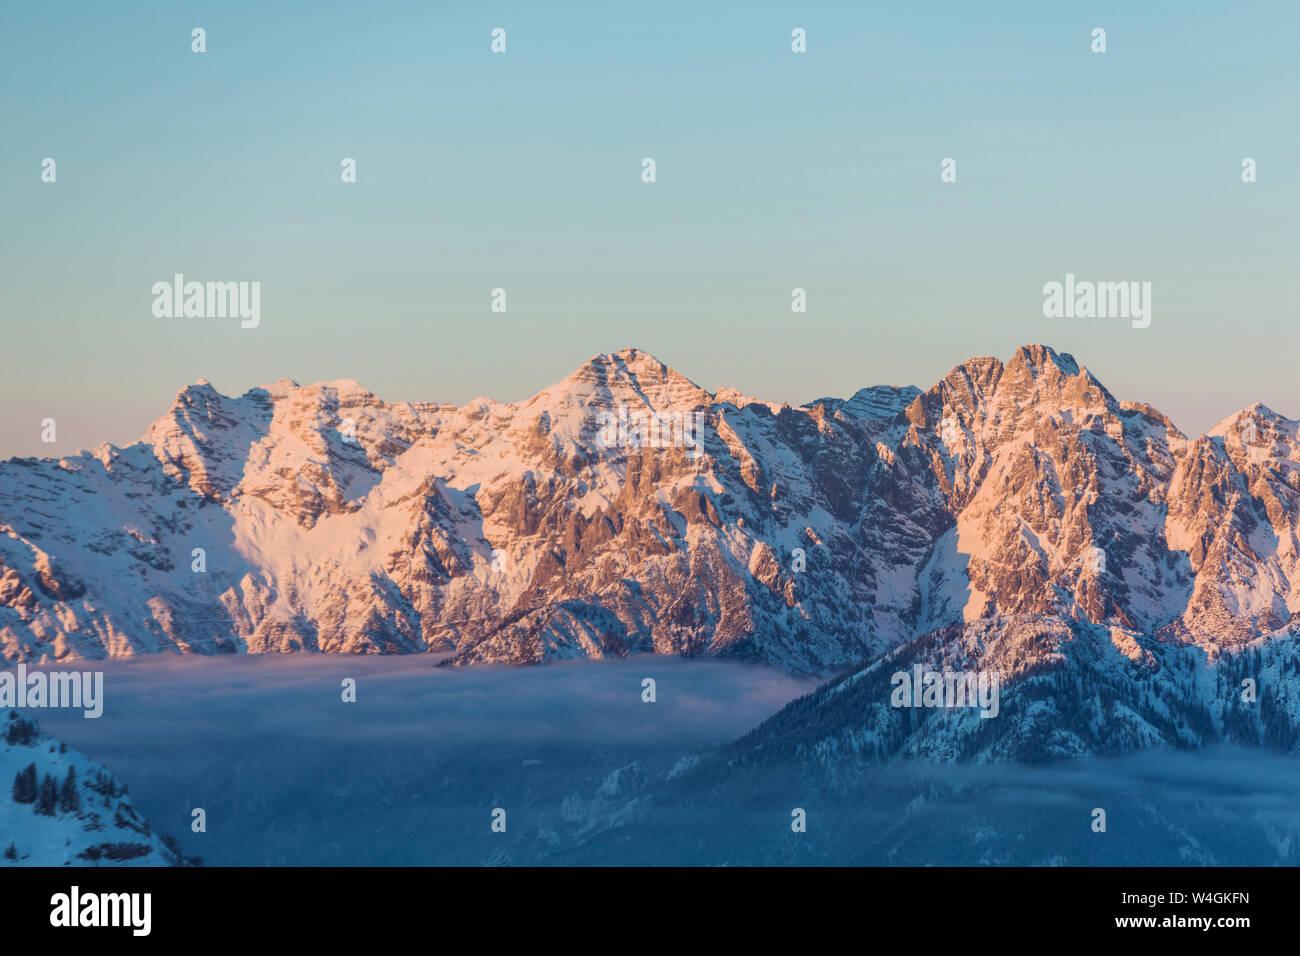 View over snowy mountains at dusk, Saalbach Hinterglemm, Pinzgau, Austria Stock Photo